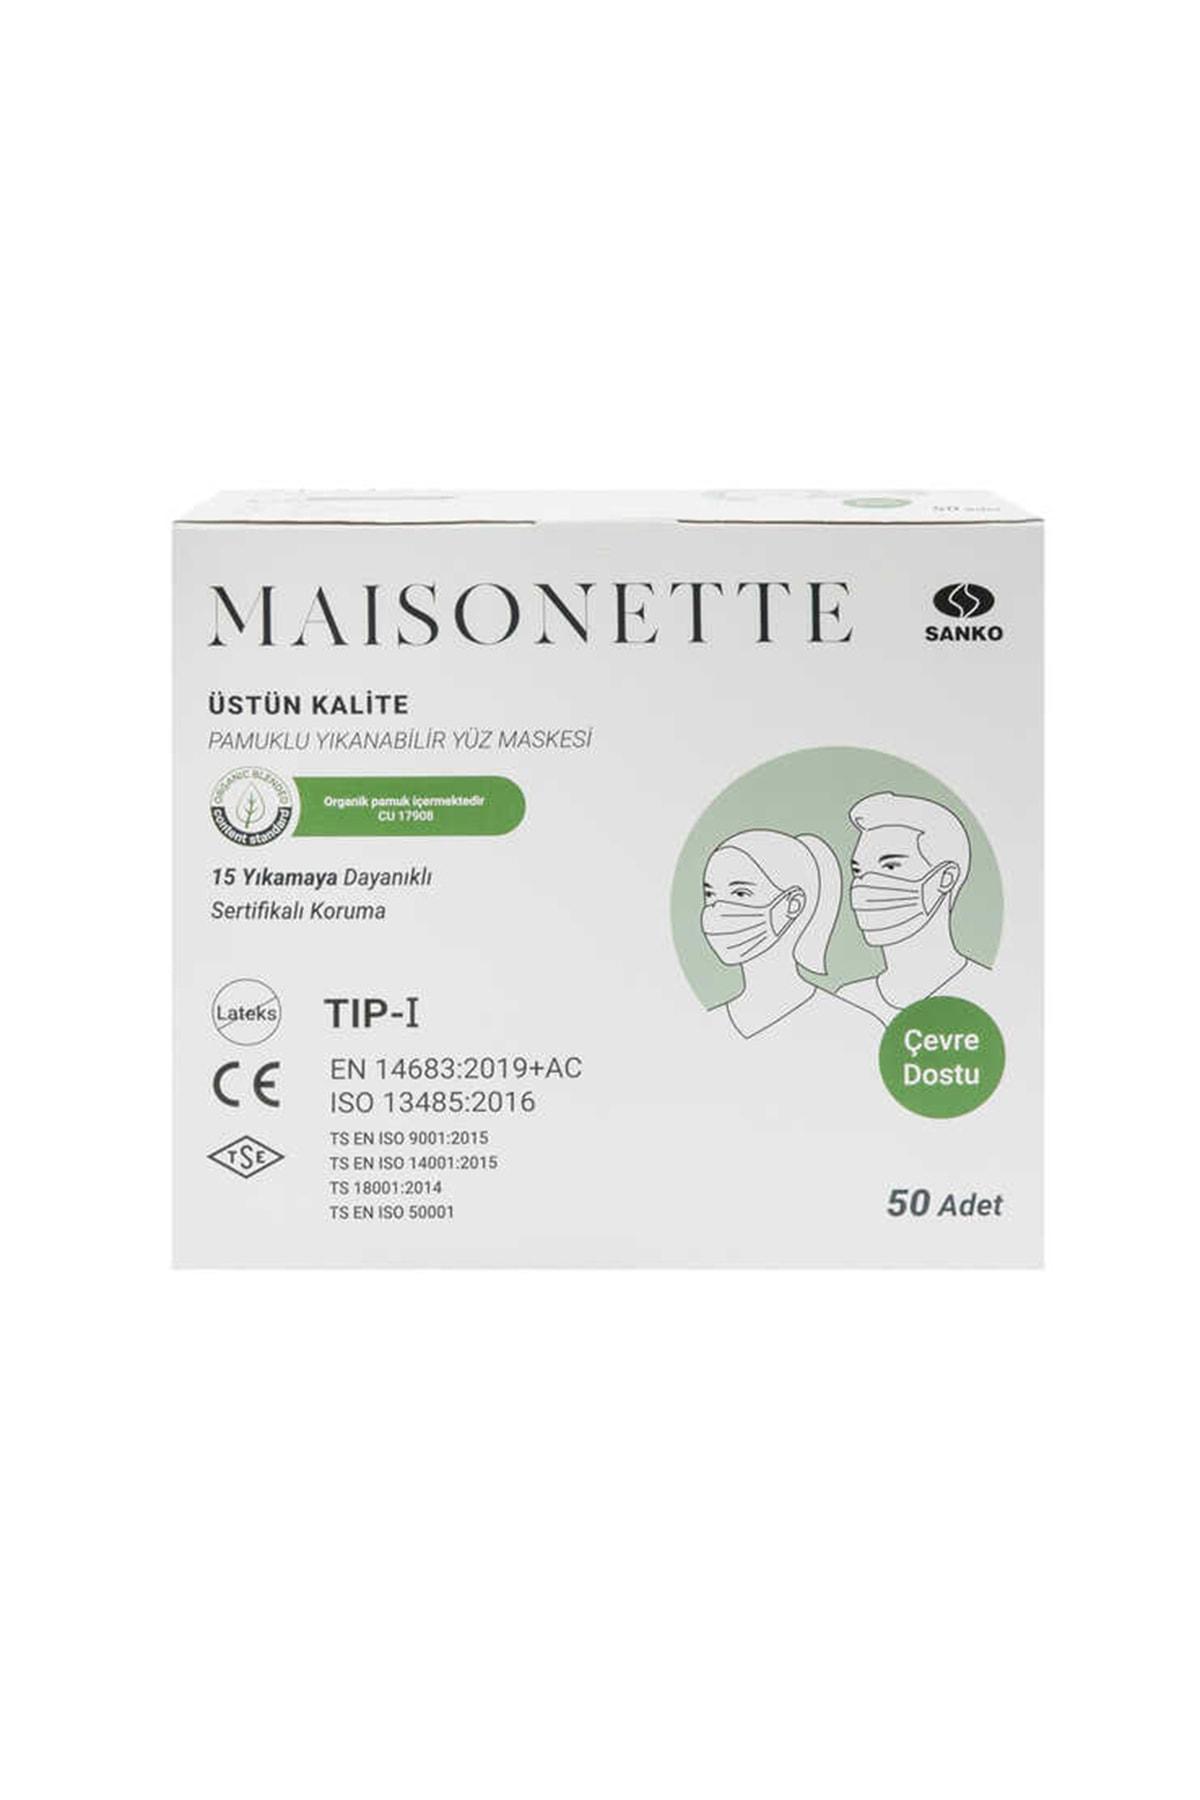 Maisonette Yıkanabilir Pamuklu Yüz Maskesi 50 li Paket 0